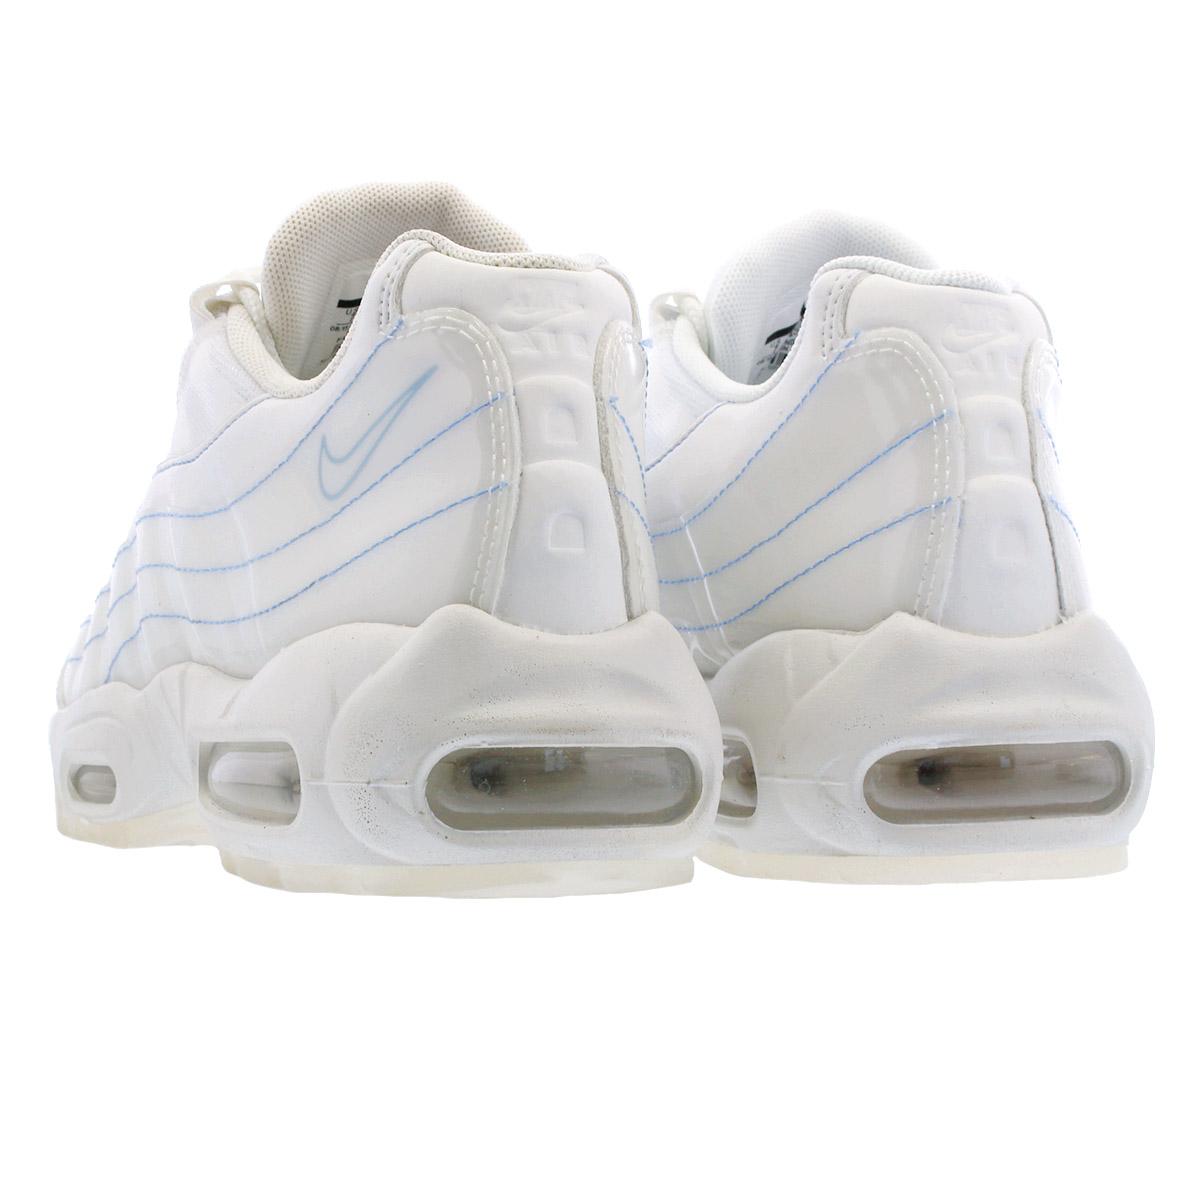 Nike Women Nike Air Max 95 SE Shoes White 918413 102